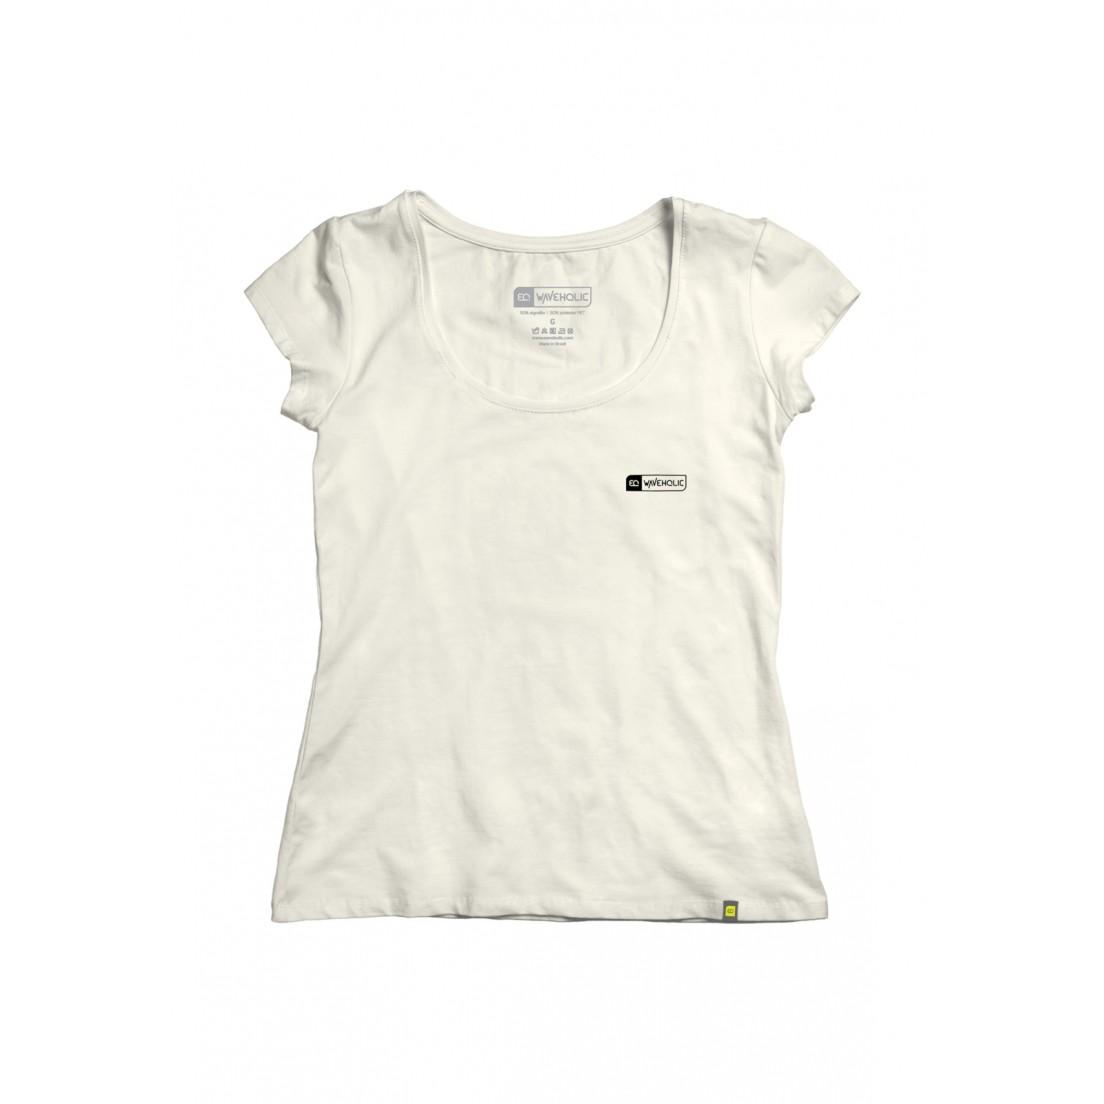 Blusa básica feminina sustentável champagne em malha ecológica